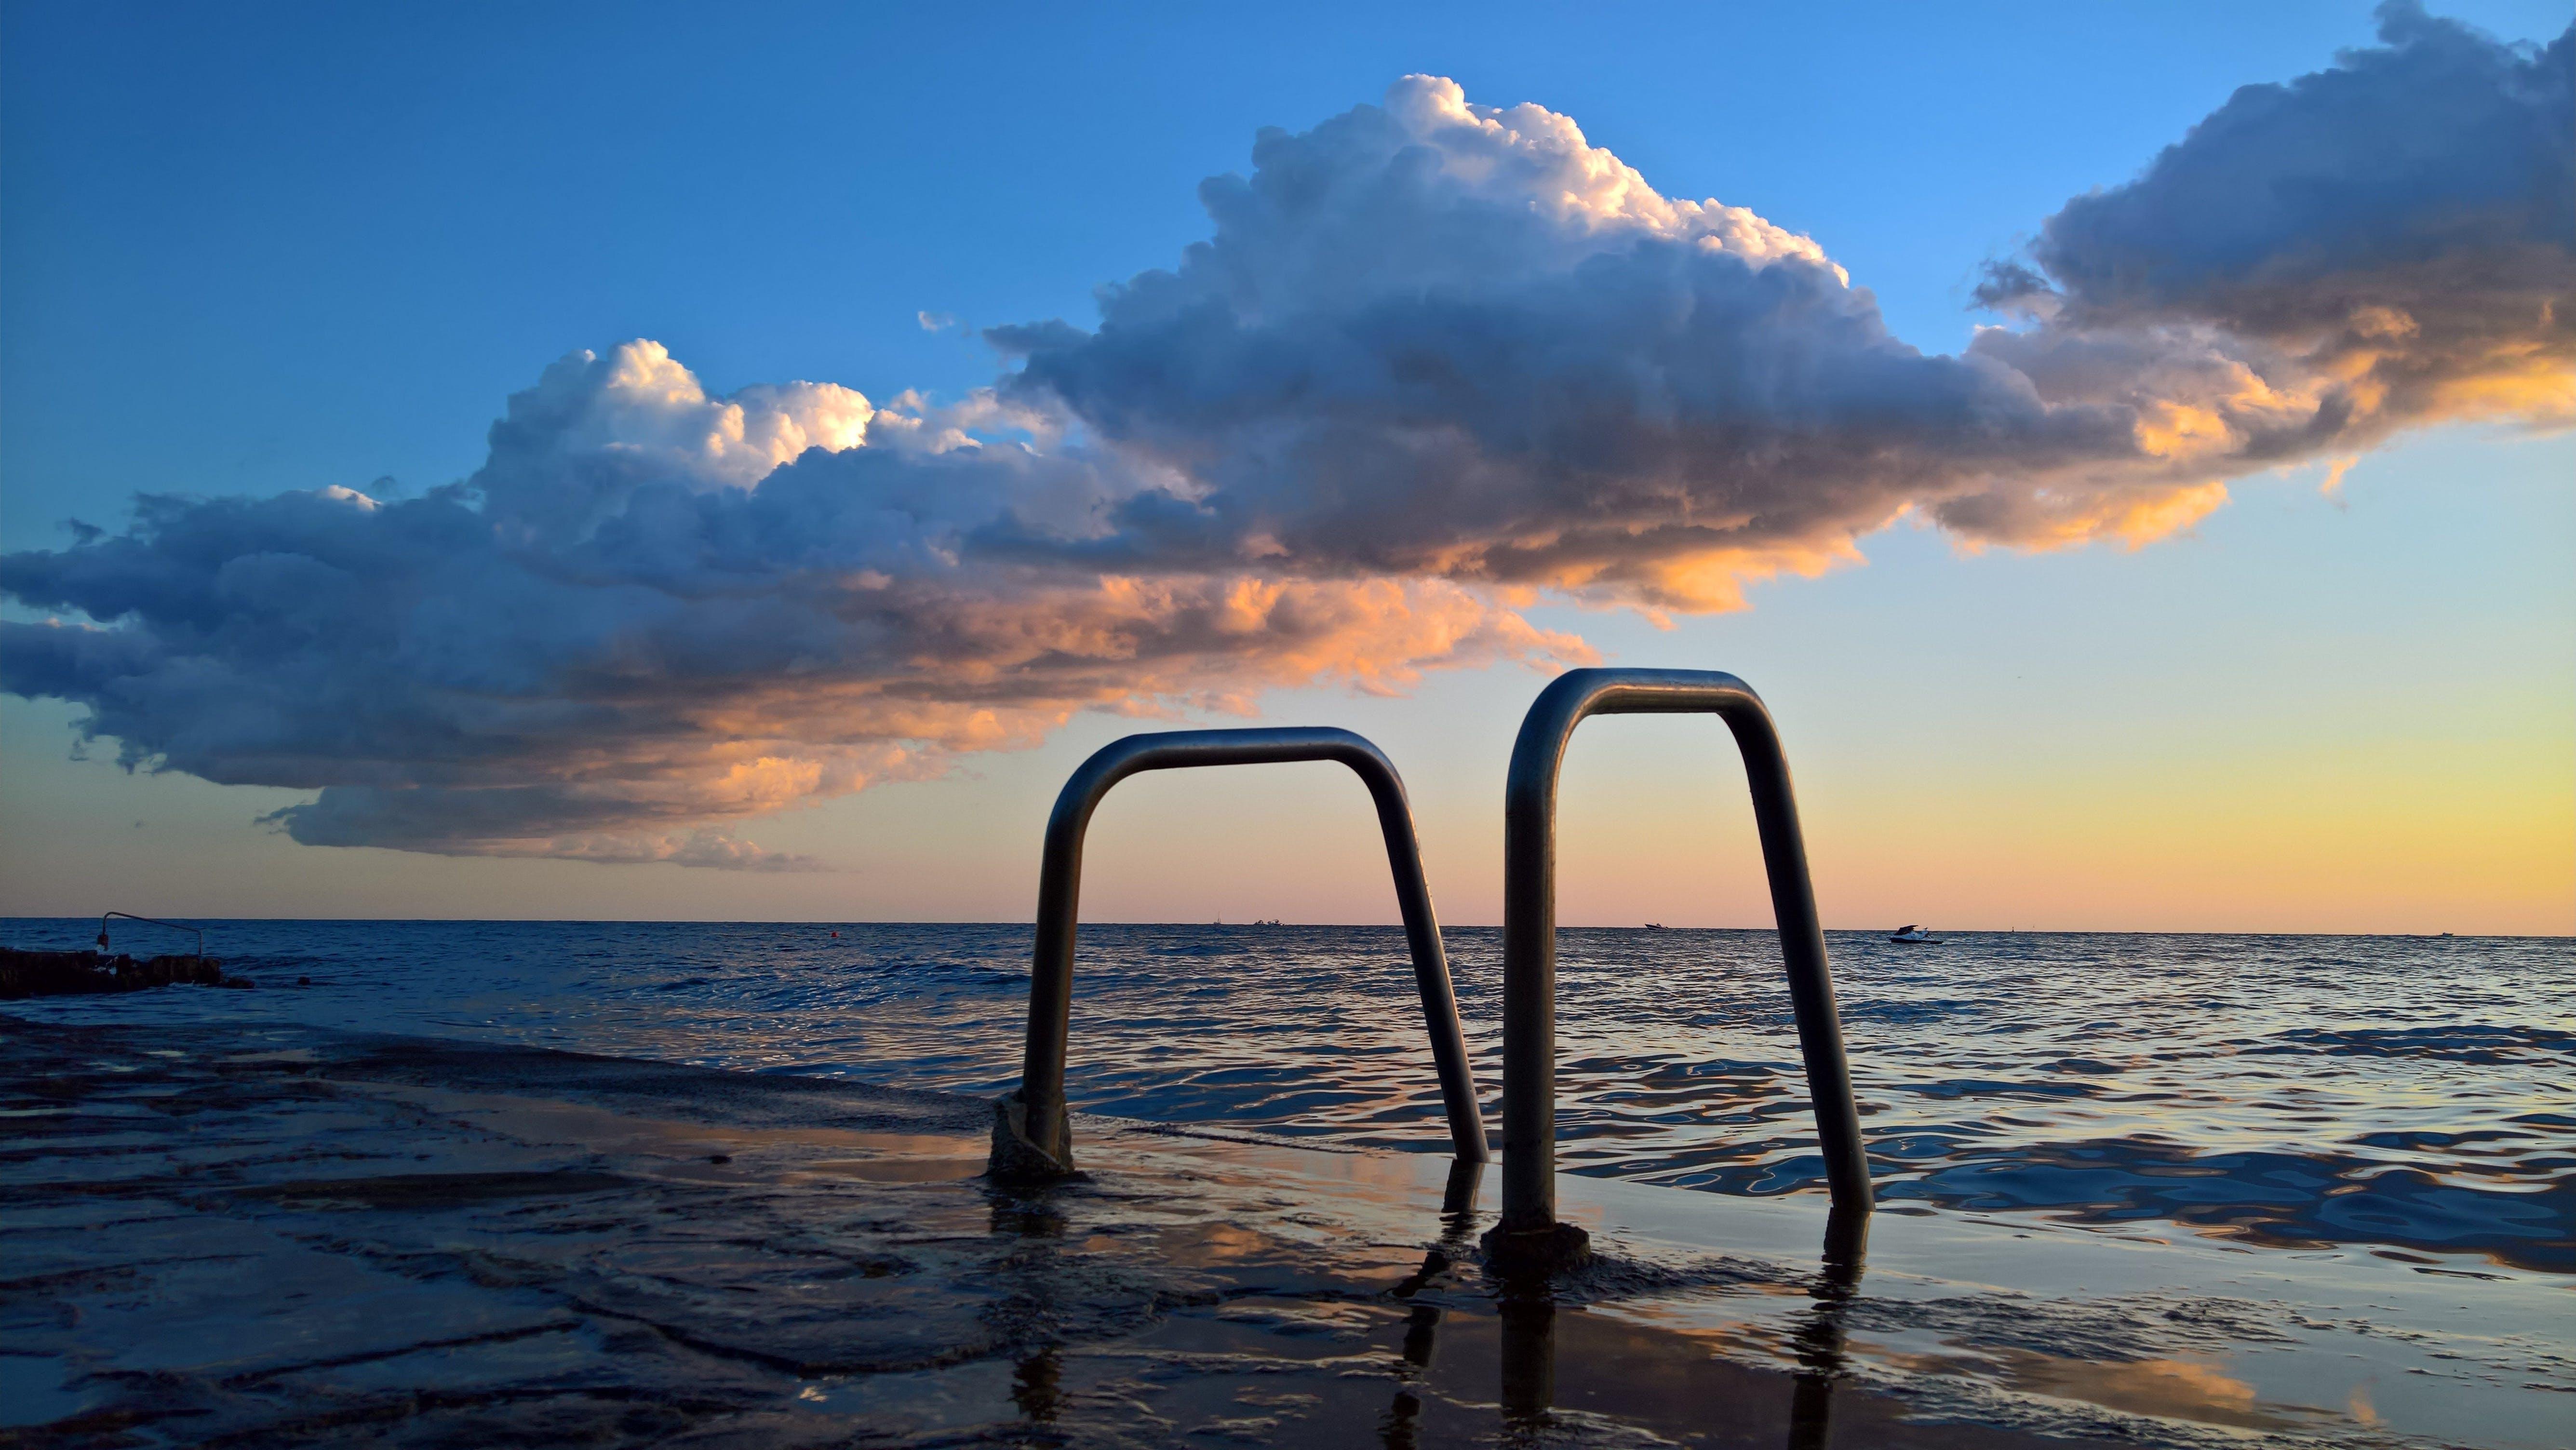 Free stock photo of sea, sunset, clouds, romance